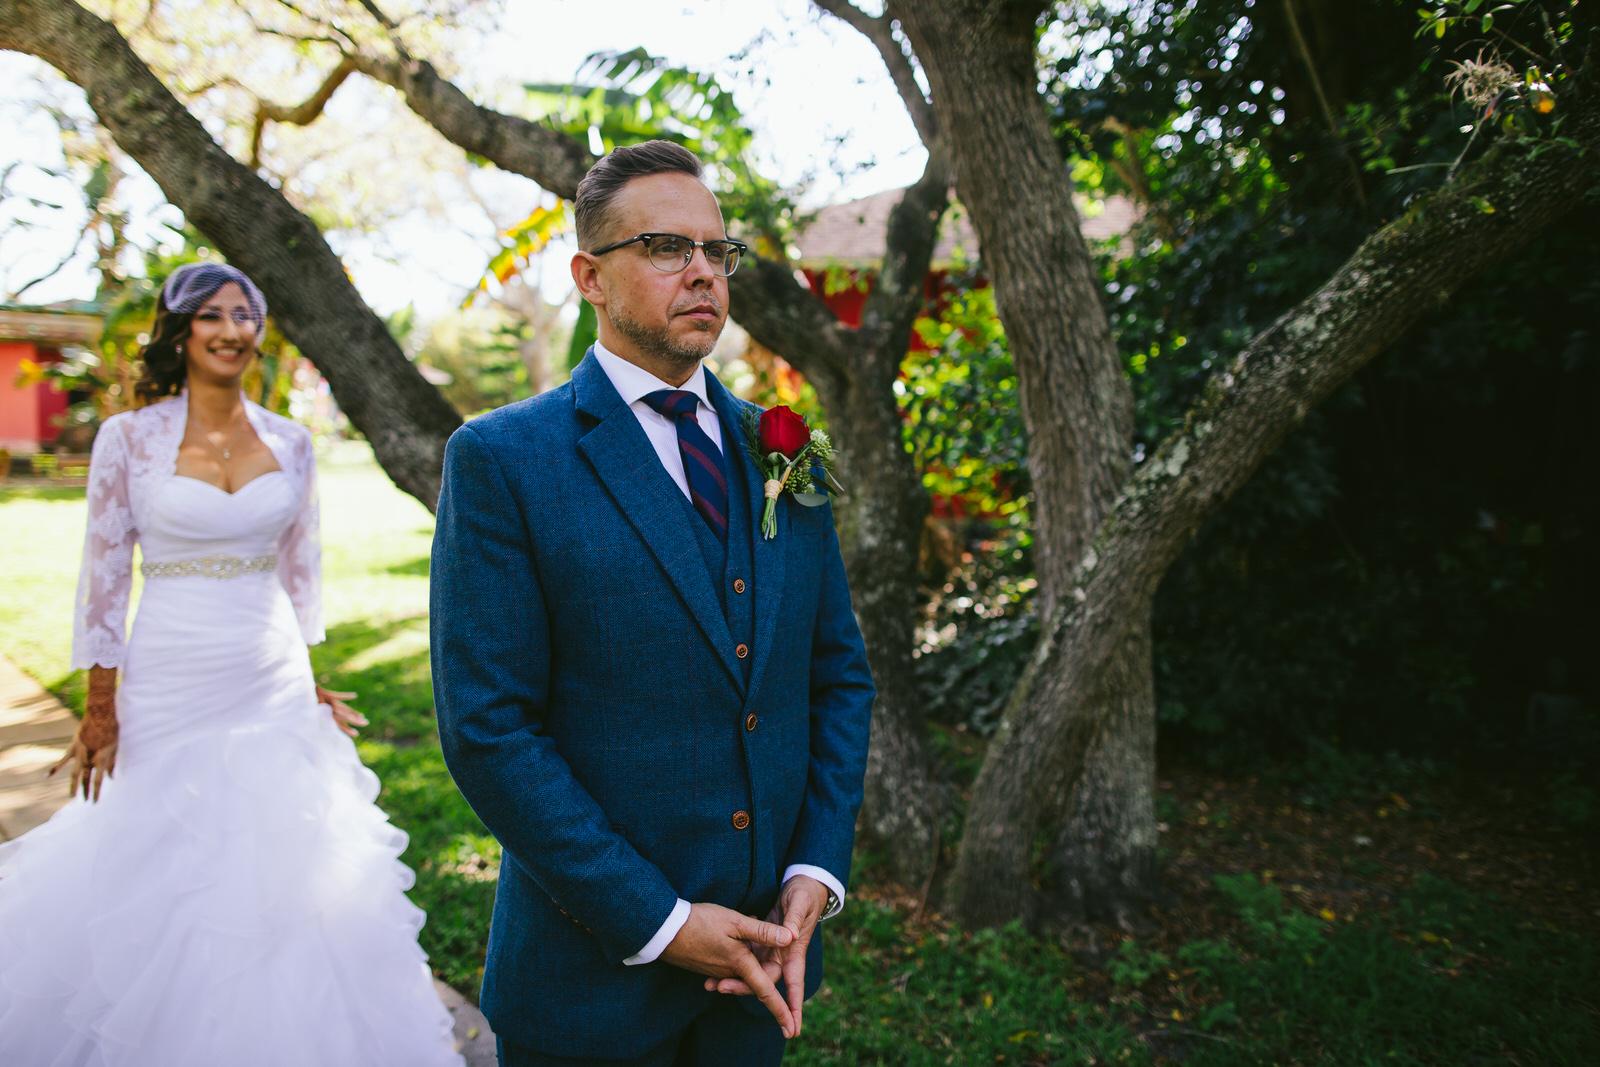 kashi-ashram-wedding-sebastian-florida-tiny-house-photo-first-look-bride-groom.jpg